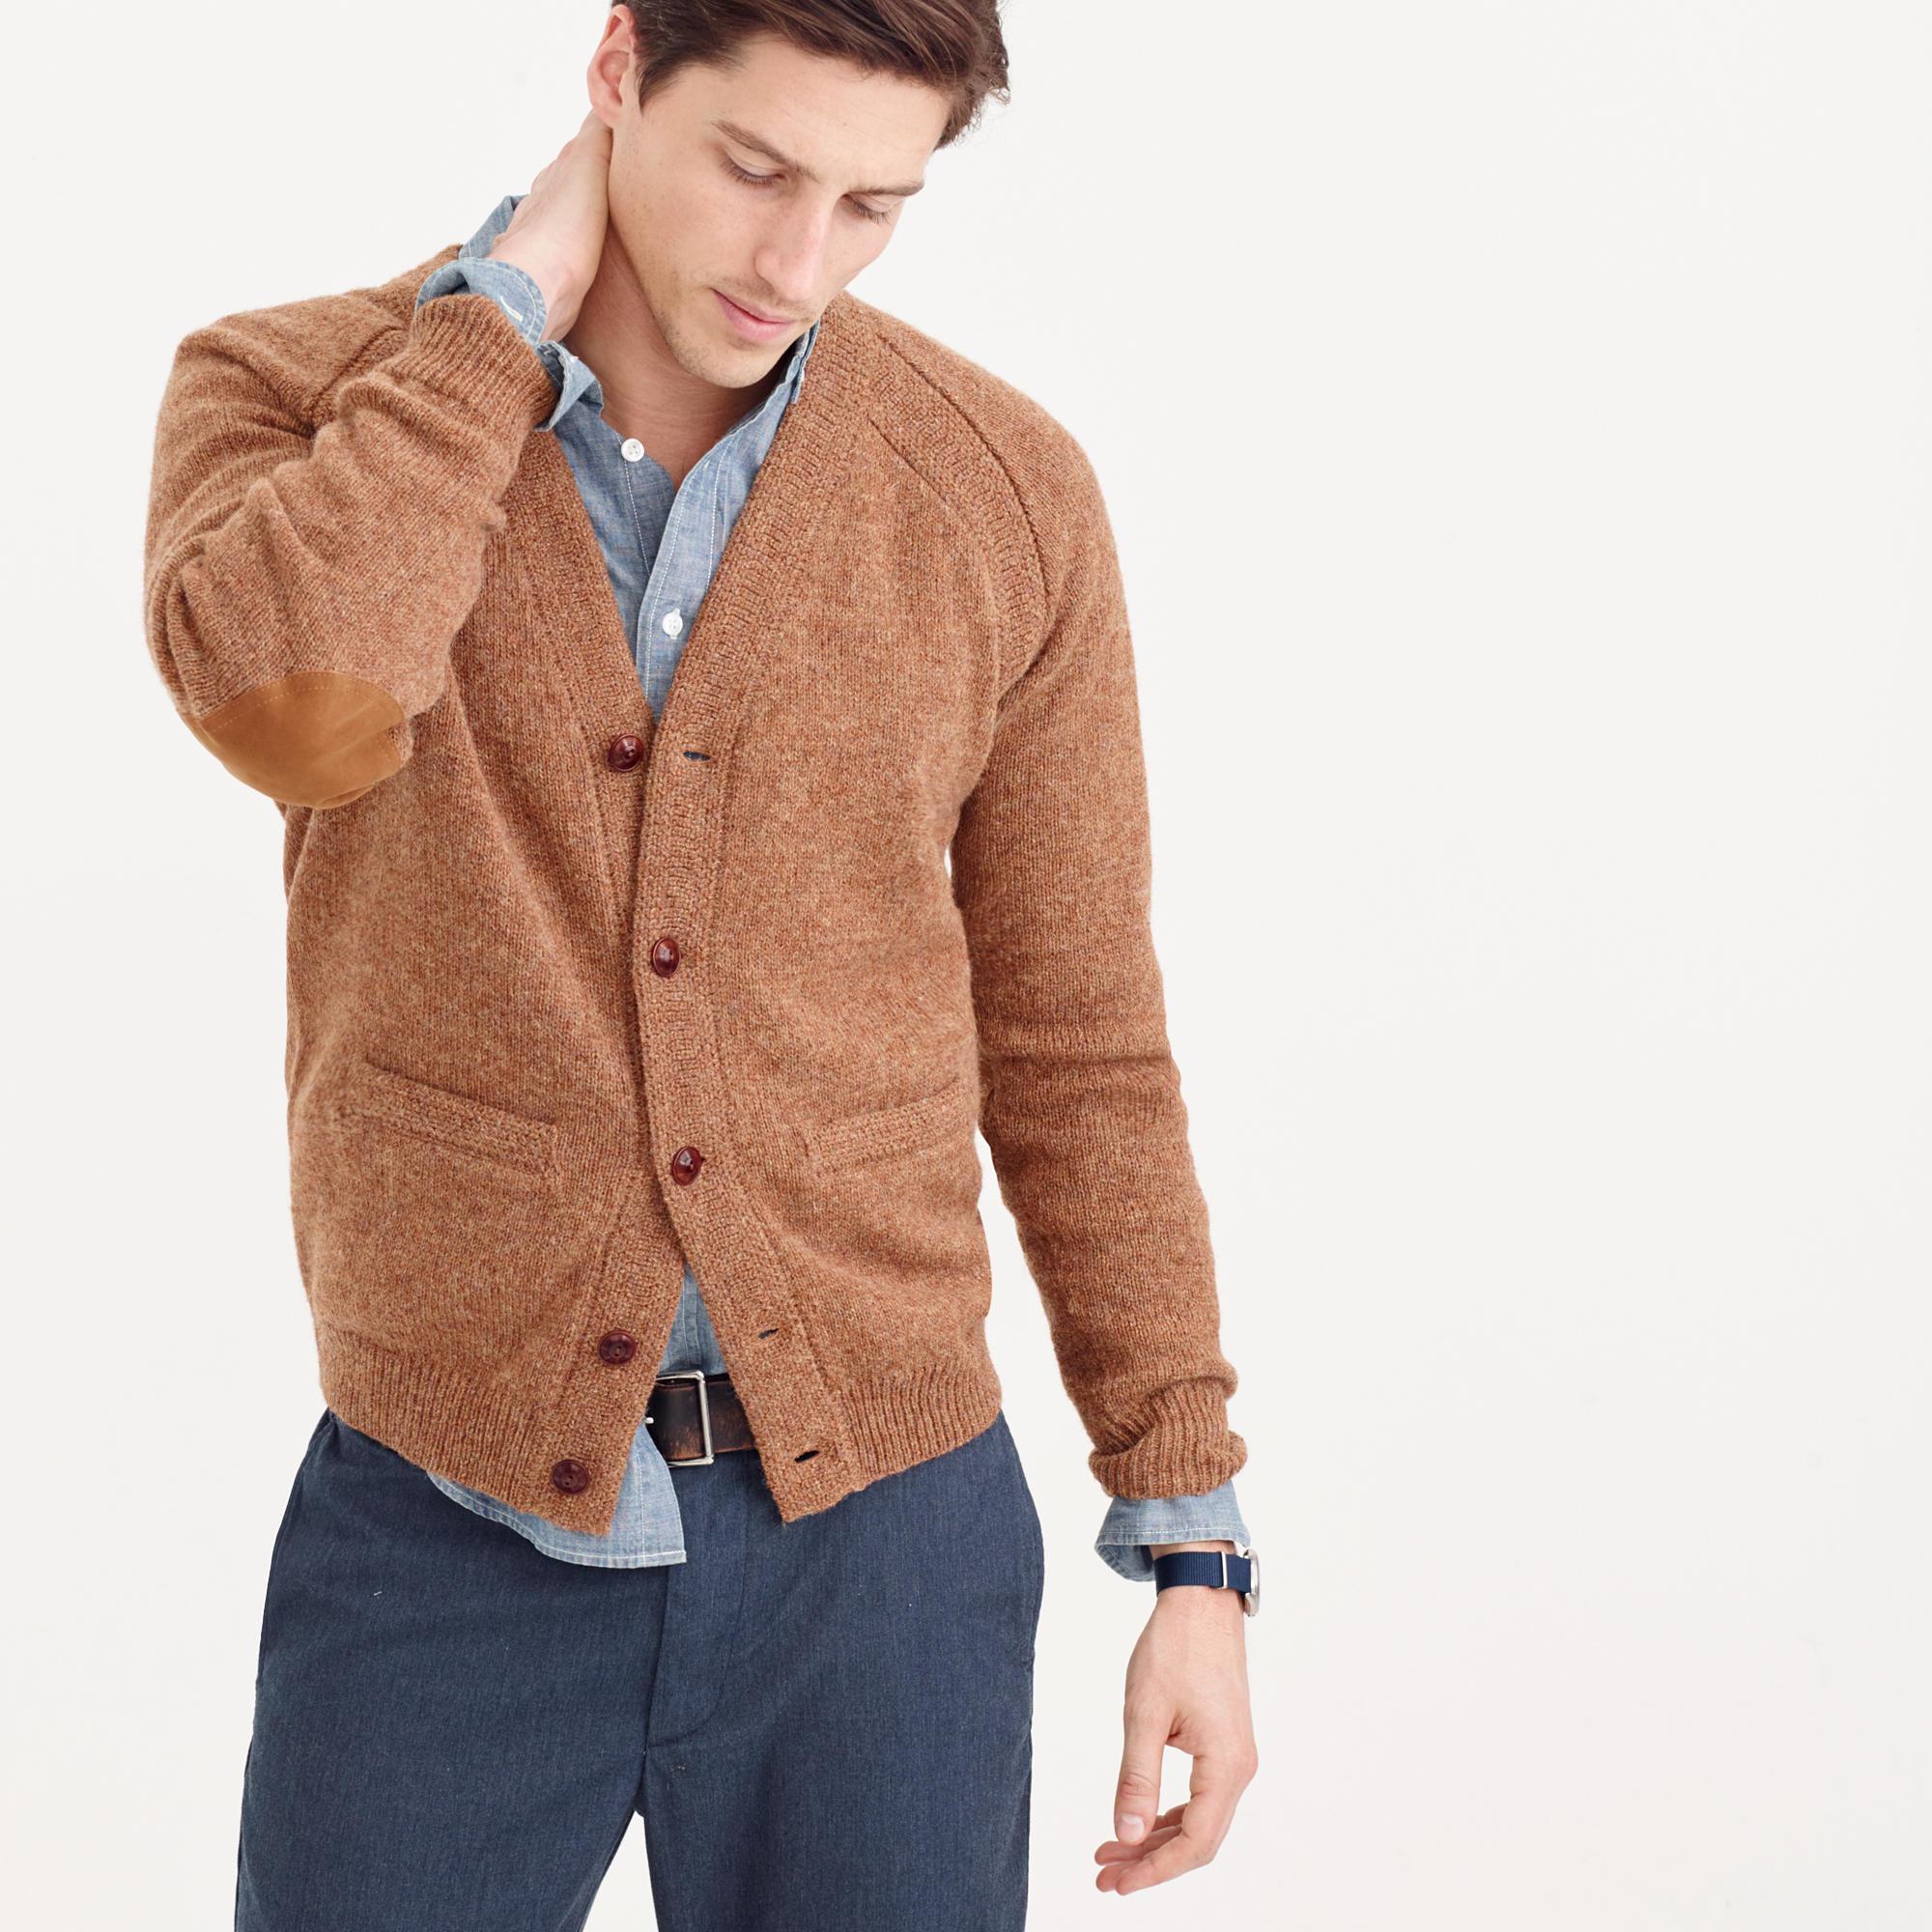 Jcrew Wallace Barnes English Shetland Wool Cardigan Sweater In